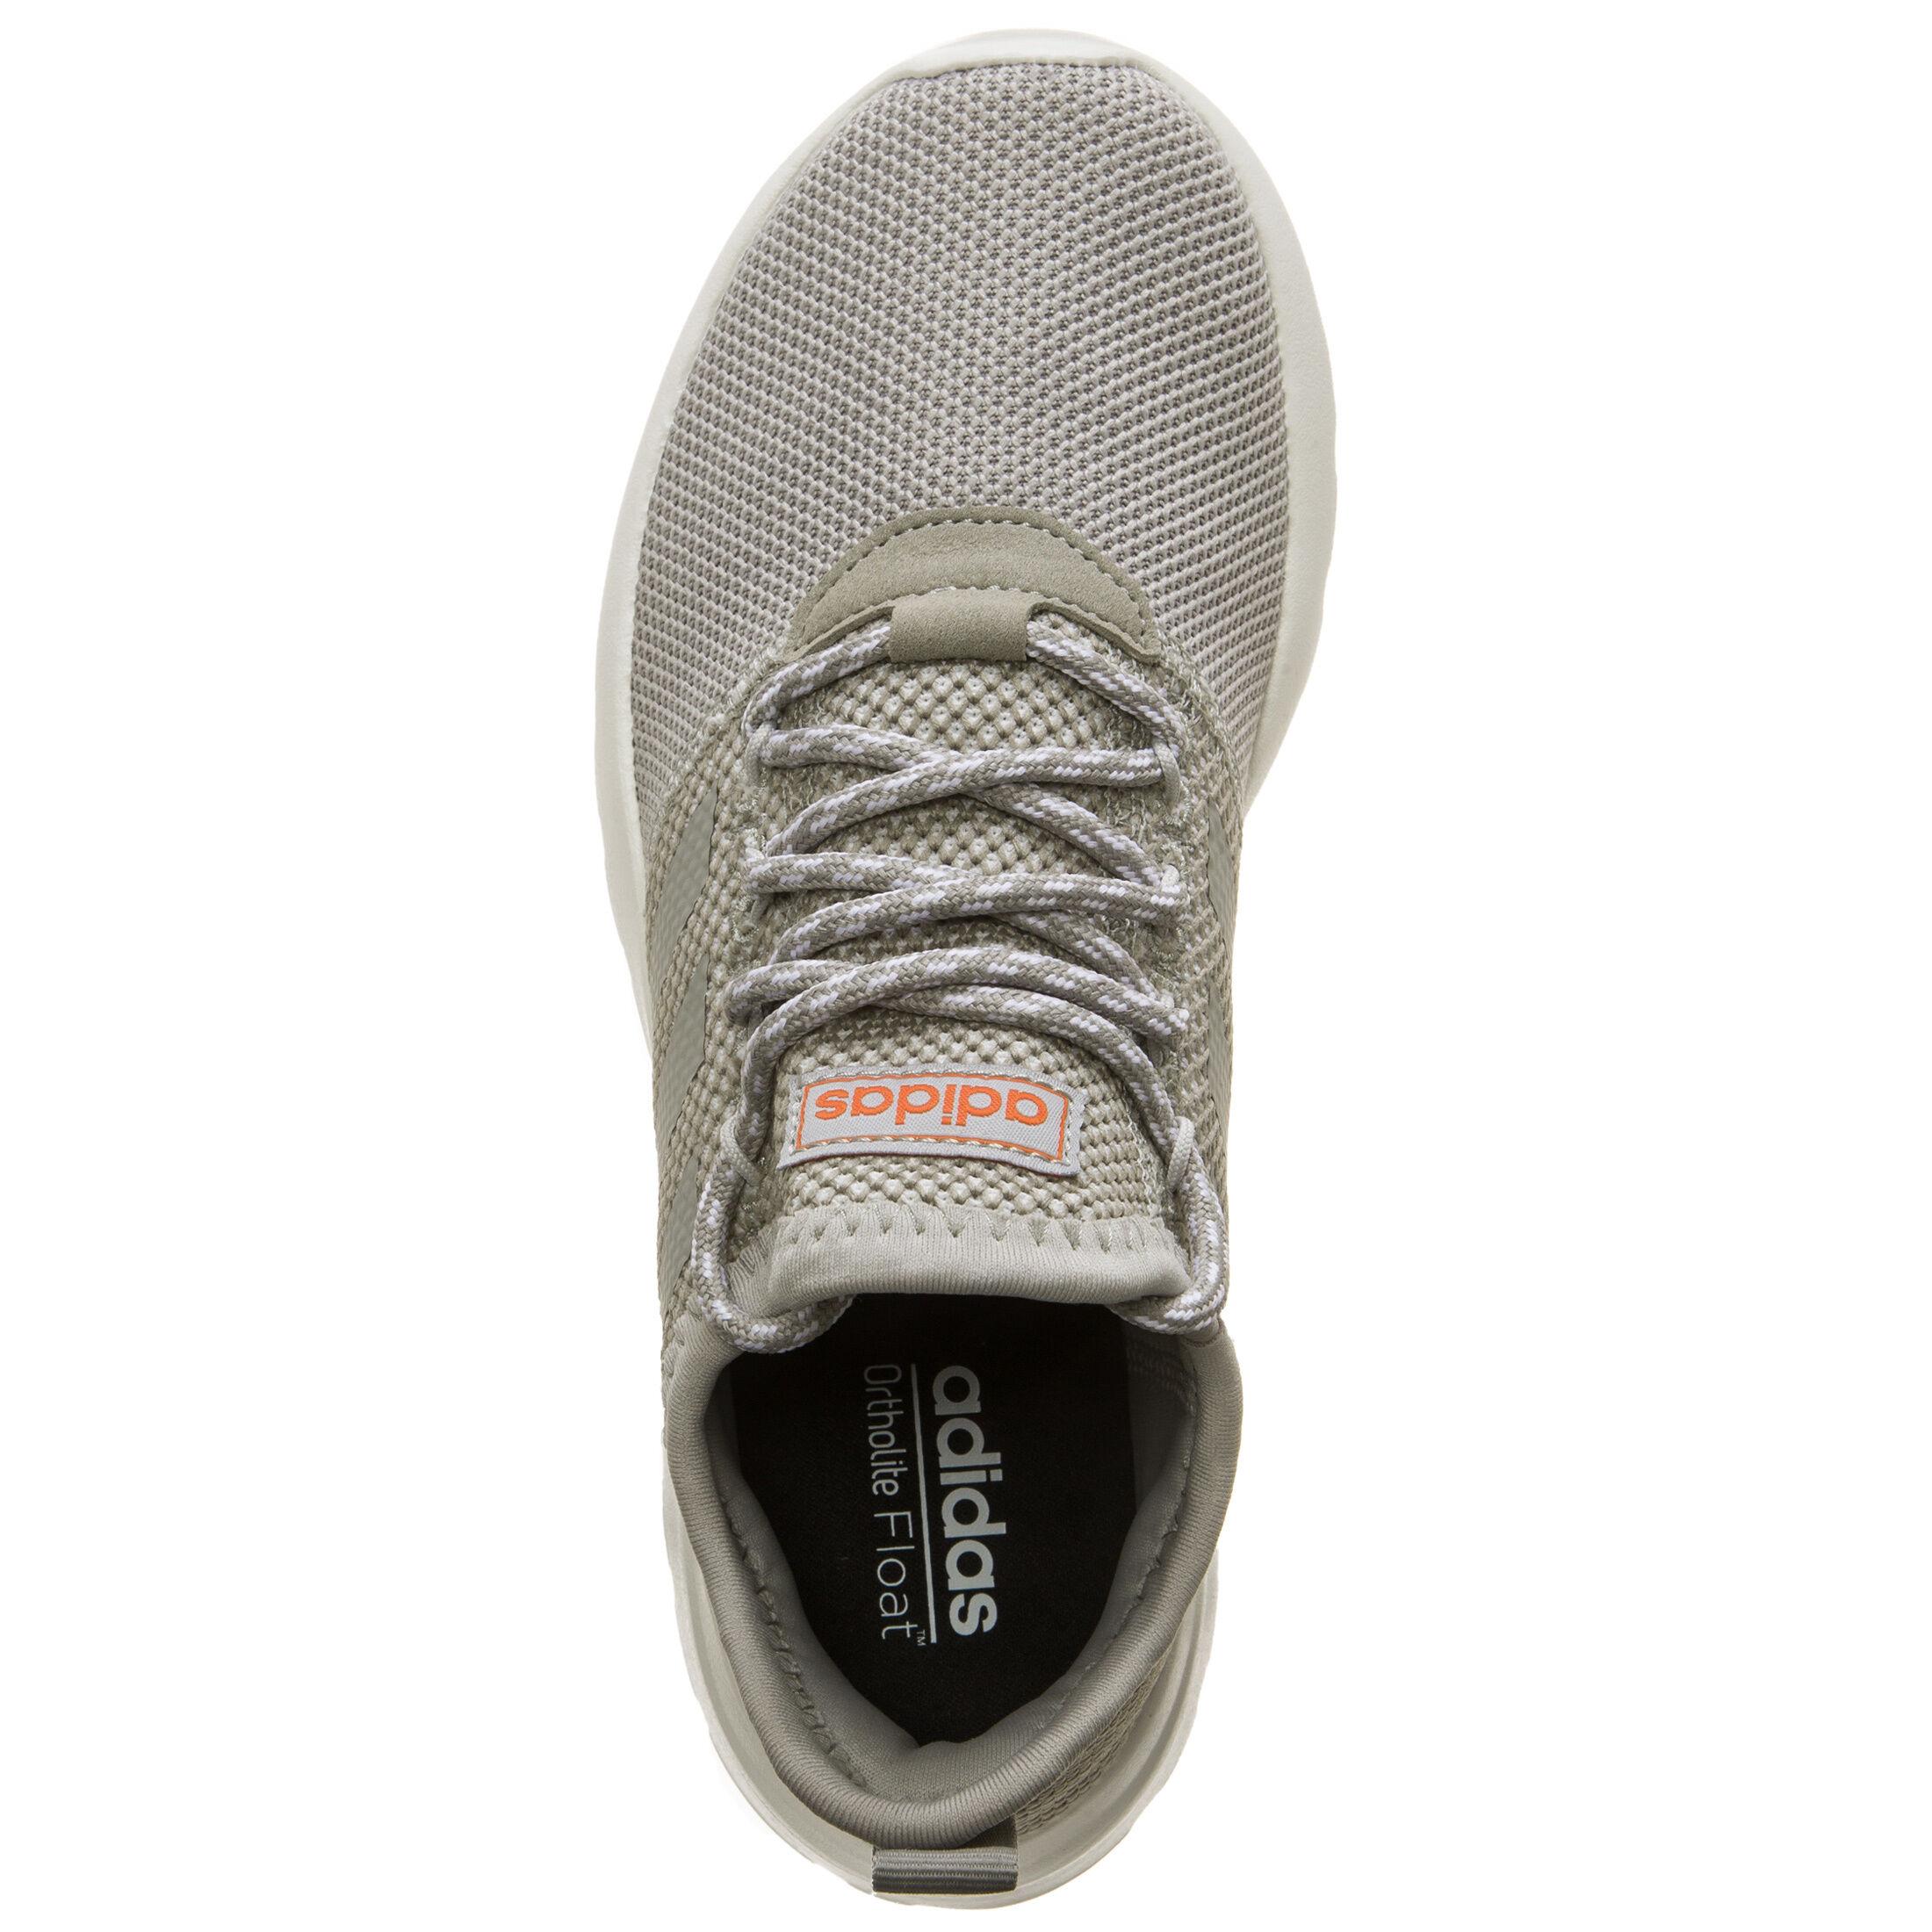 Lite Rbn Sneaker Adidas Outfitter Damen Racer Bei PkiOZuX